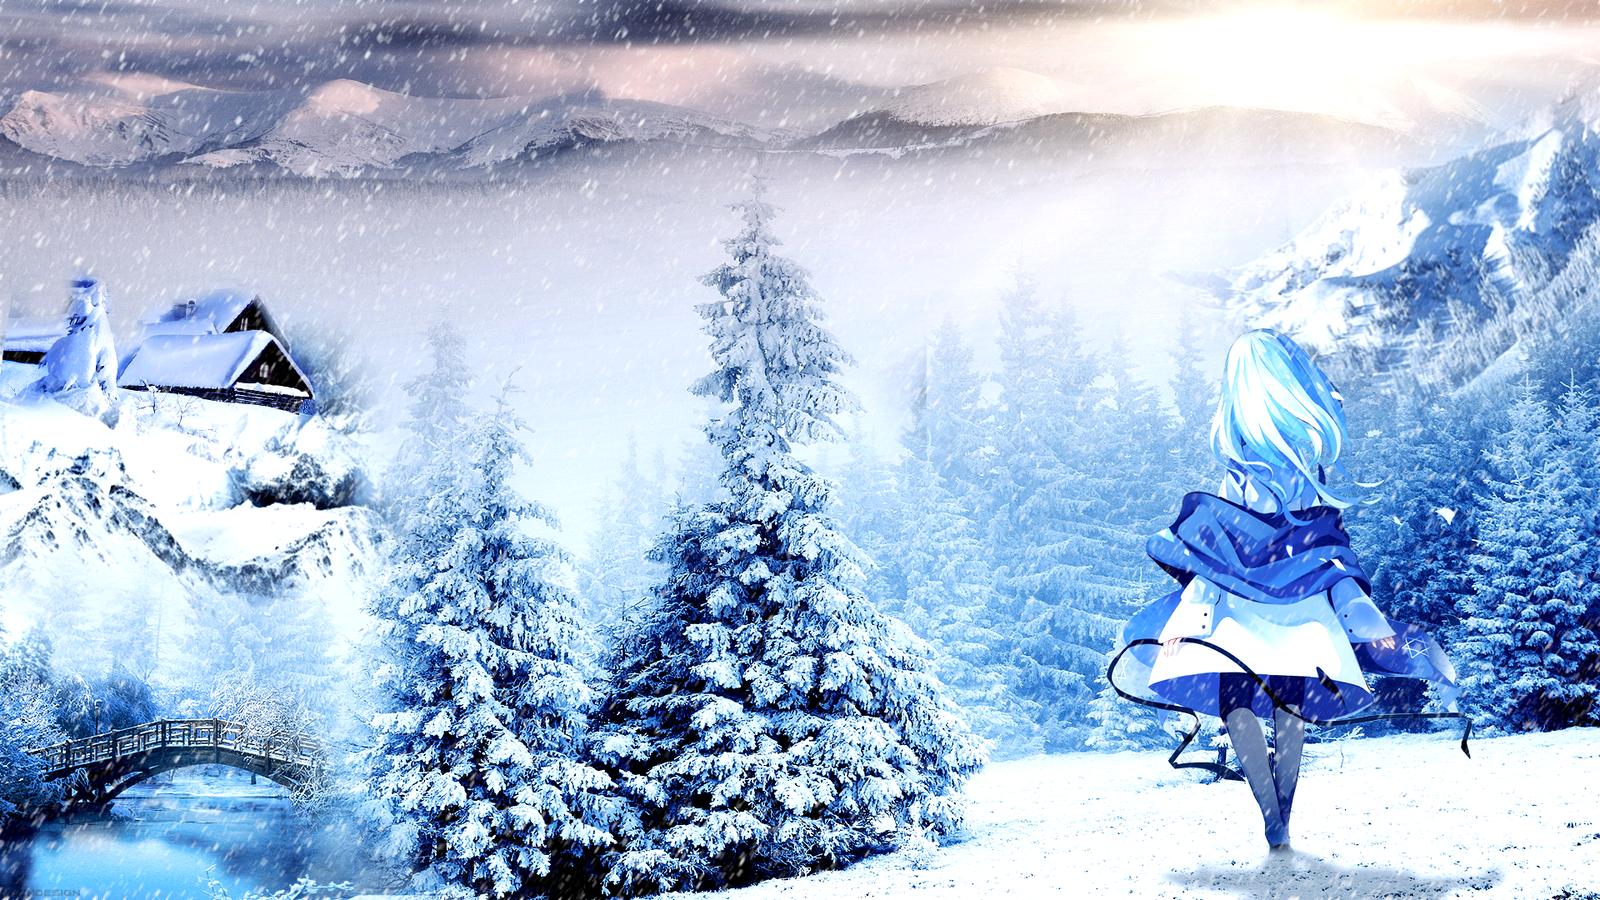 Winter Anime Wallpaper by ATNDesign on DeviantArt